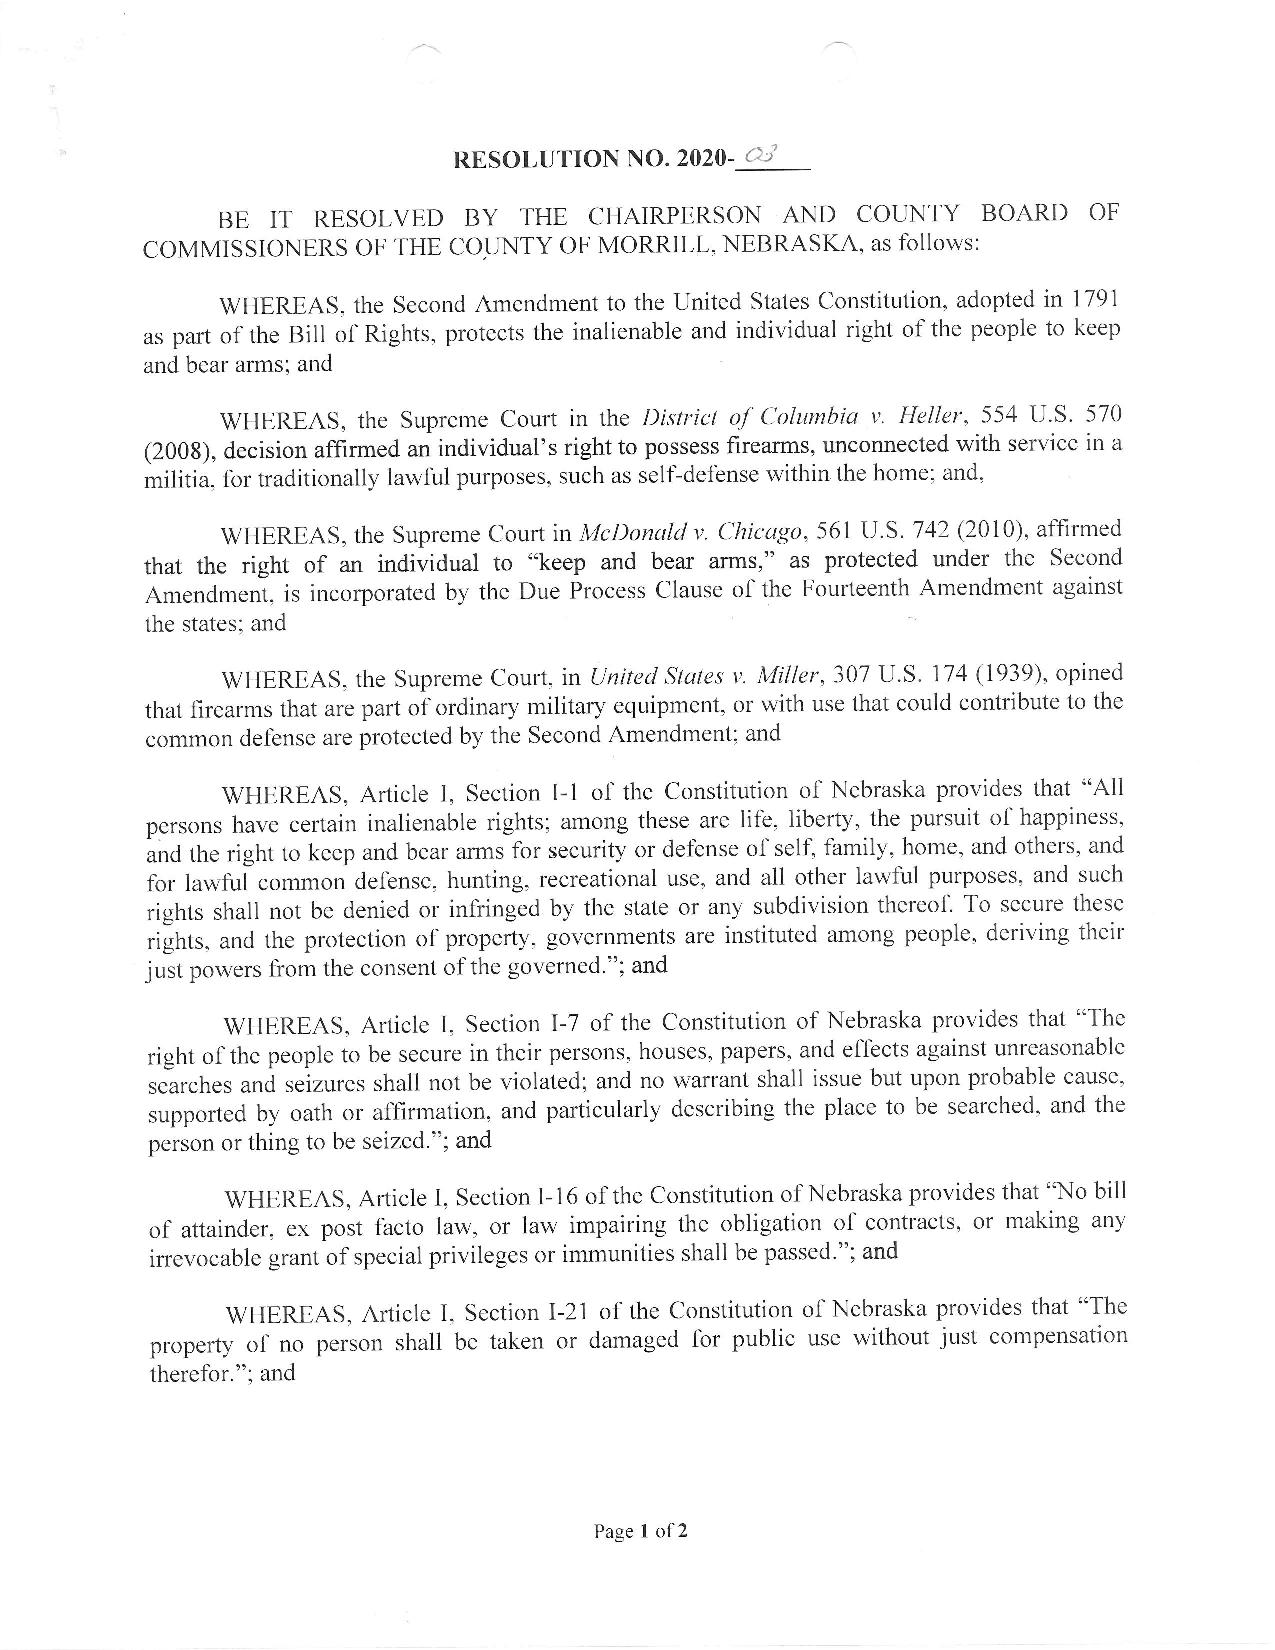 Morrill County Nebraska 2nd Amendment Resolution Page 1